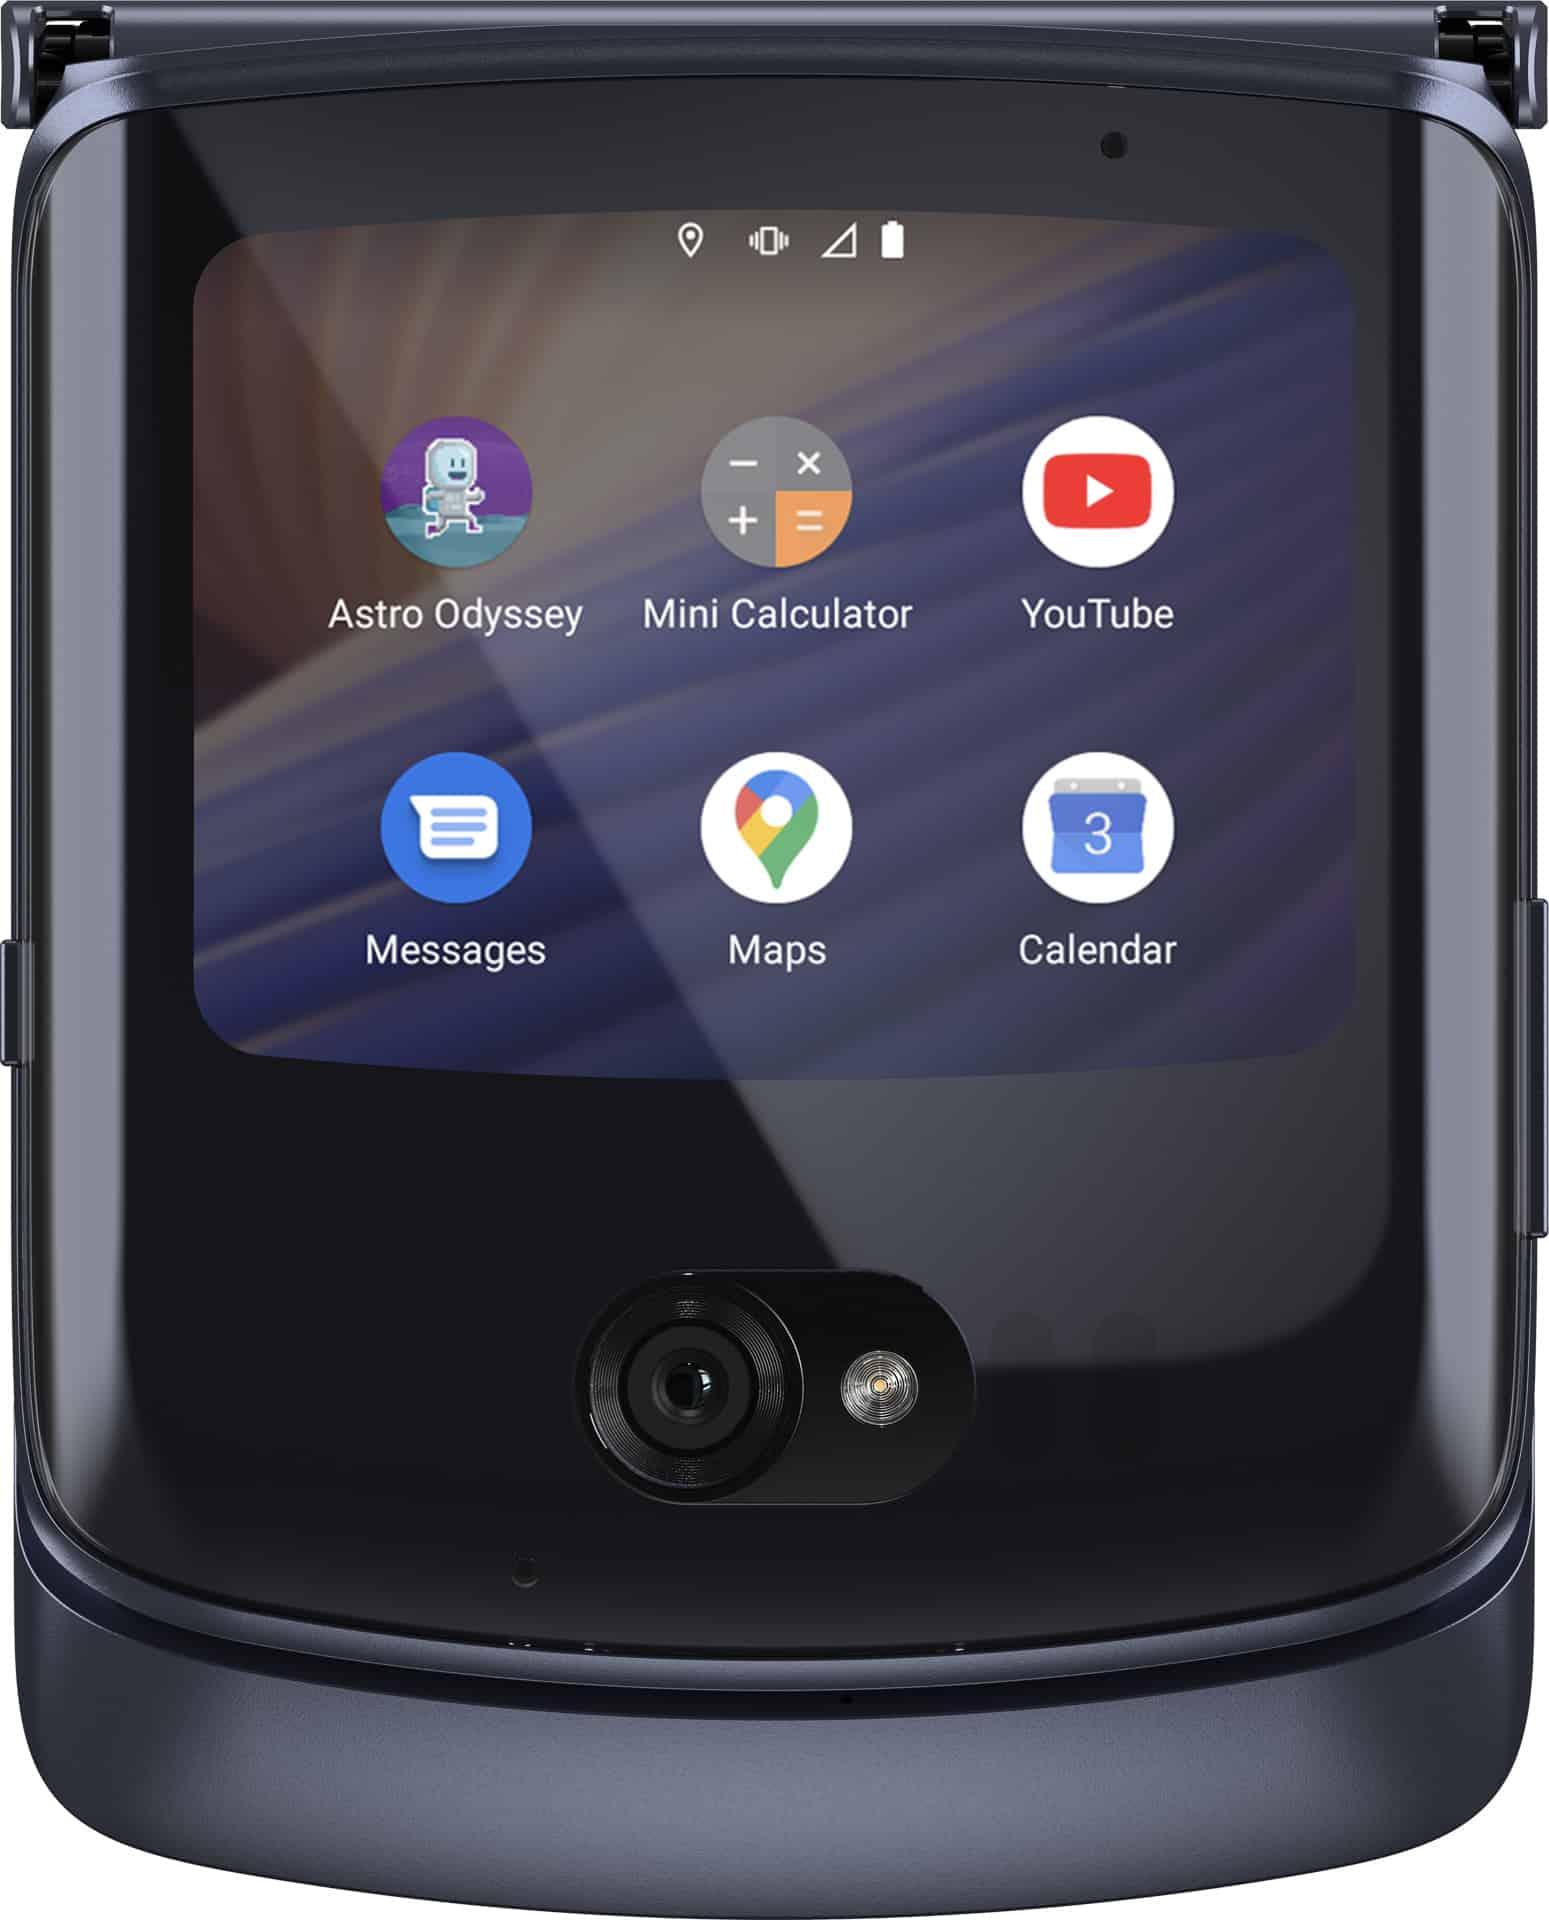 Motorola razr 5g AH 3